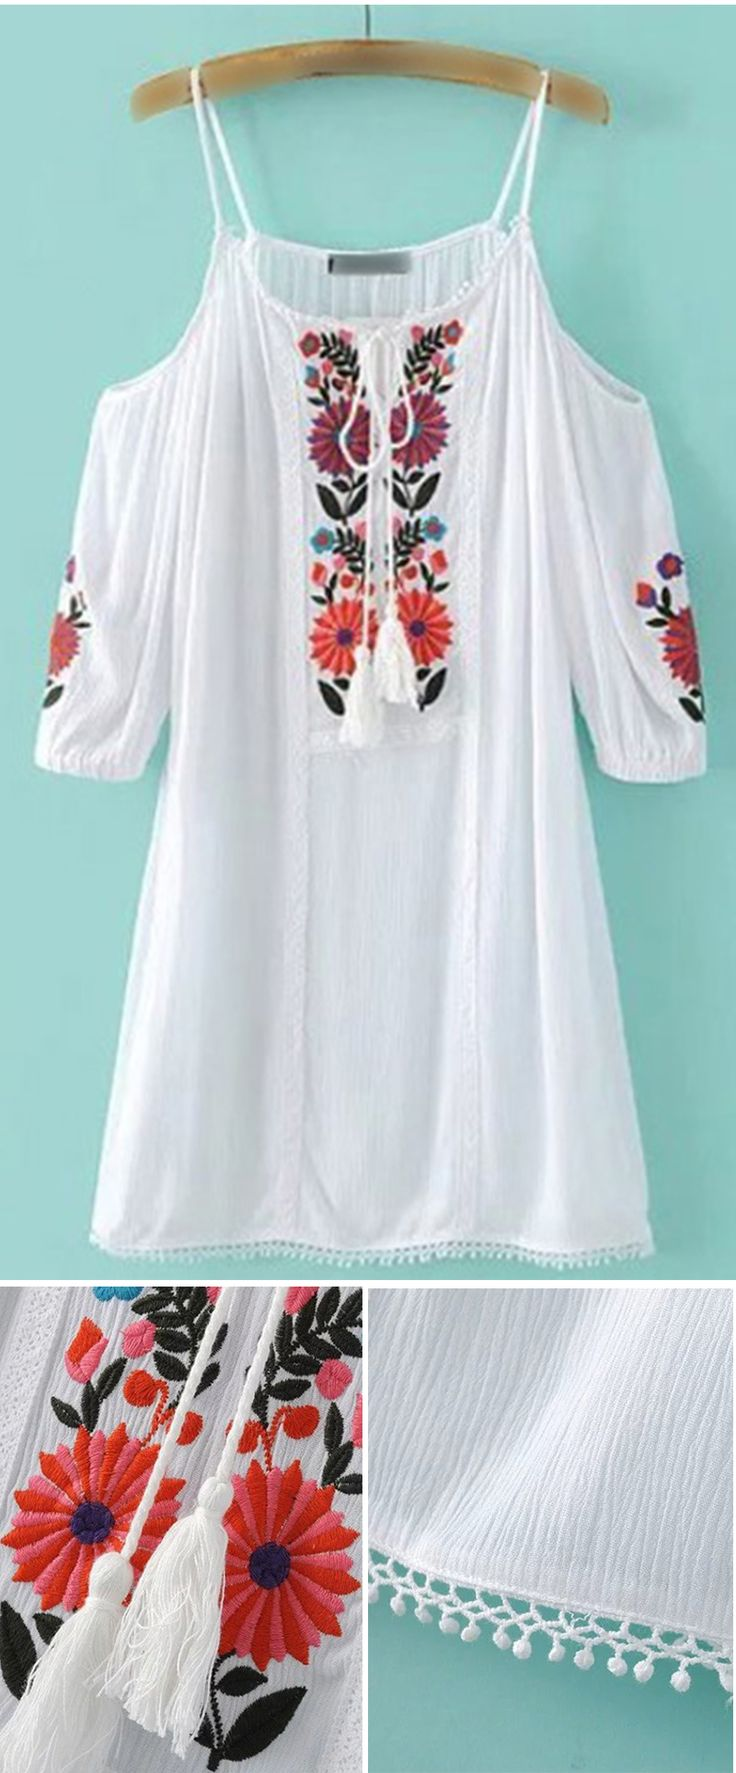 White Embroidery Cold Shoulder Tassel Dress